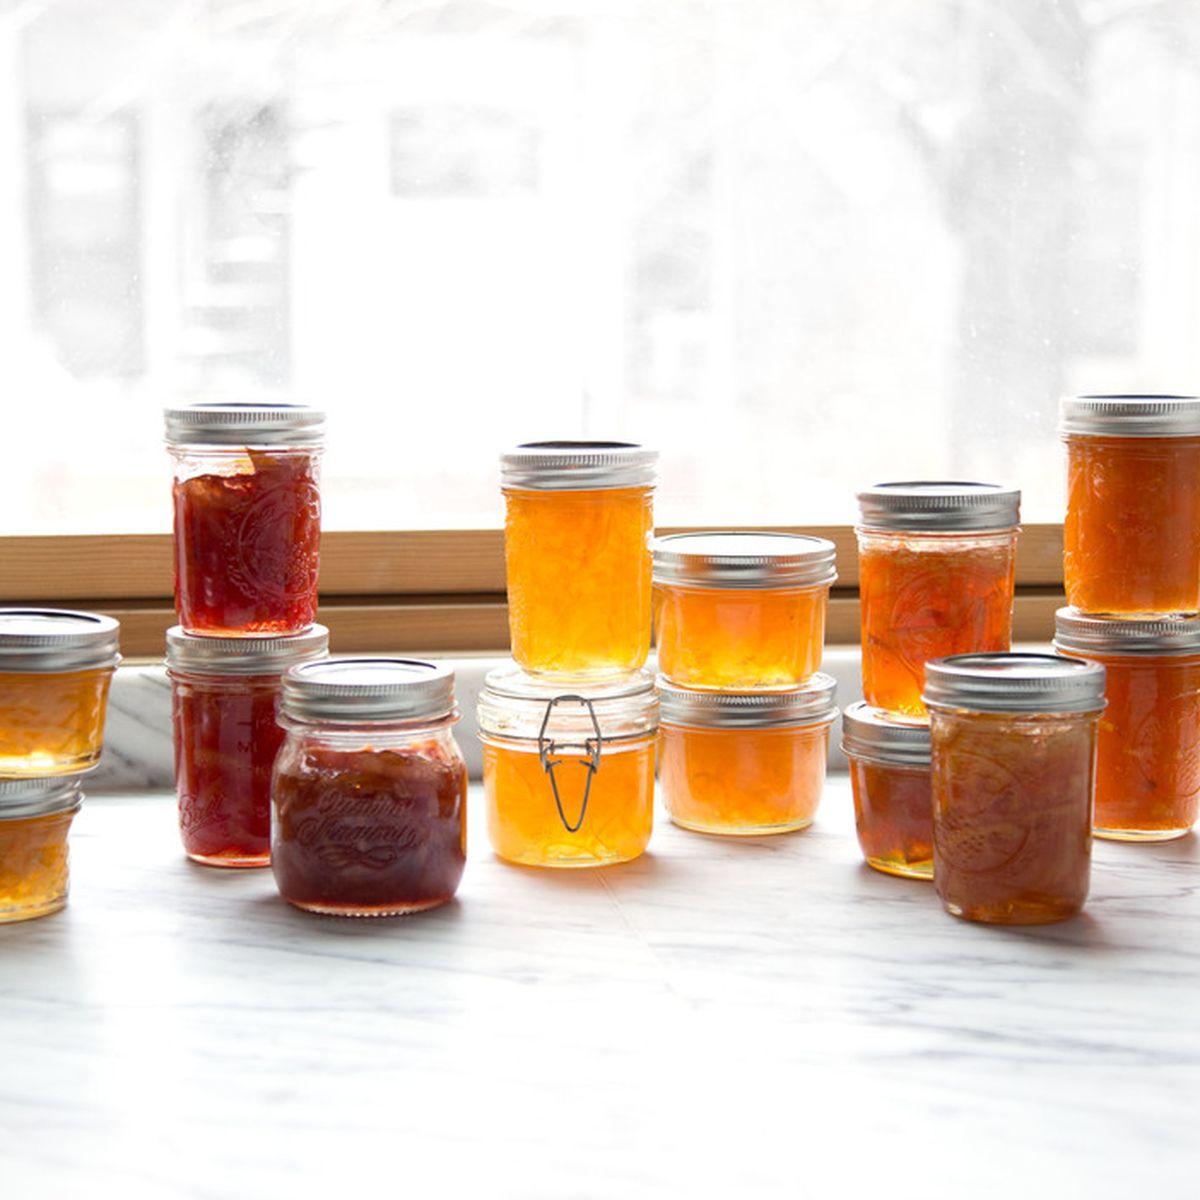 Preserve the Citrus Season with Homemade Marmalade